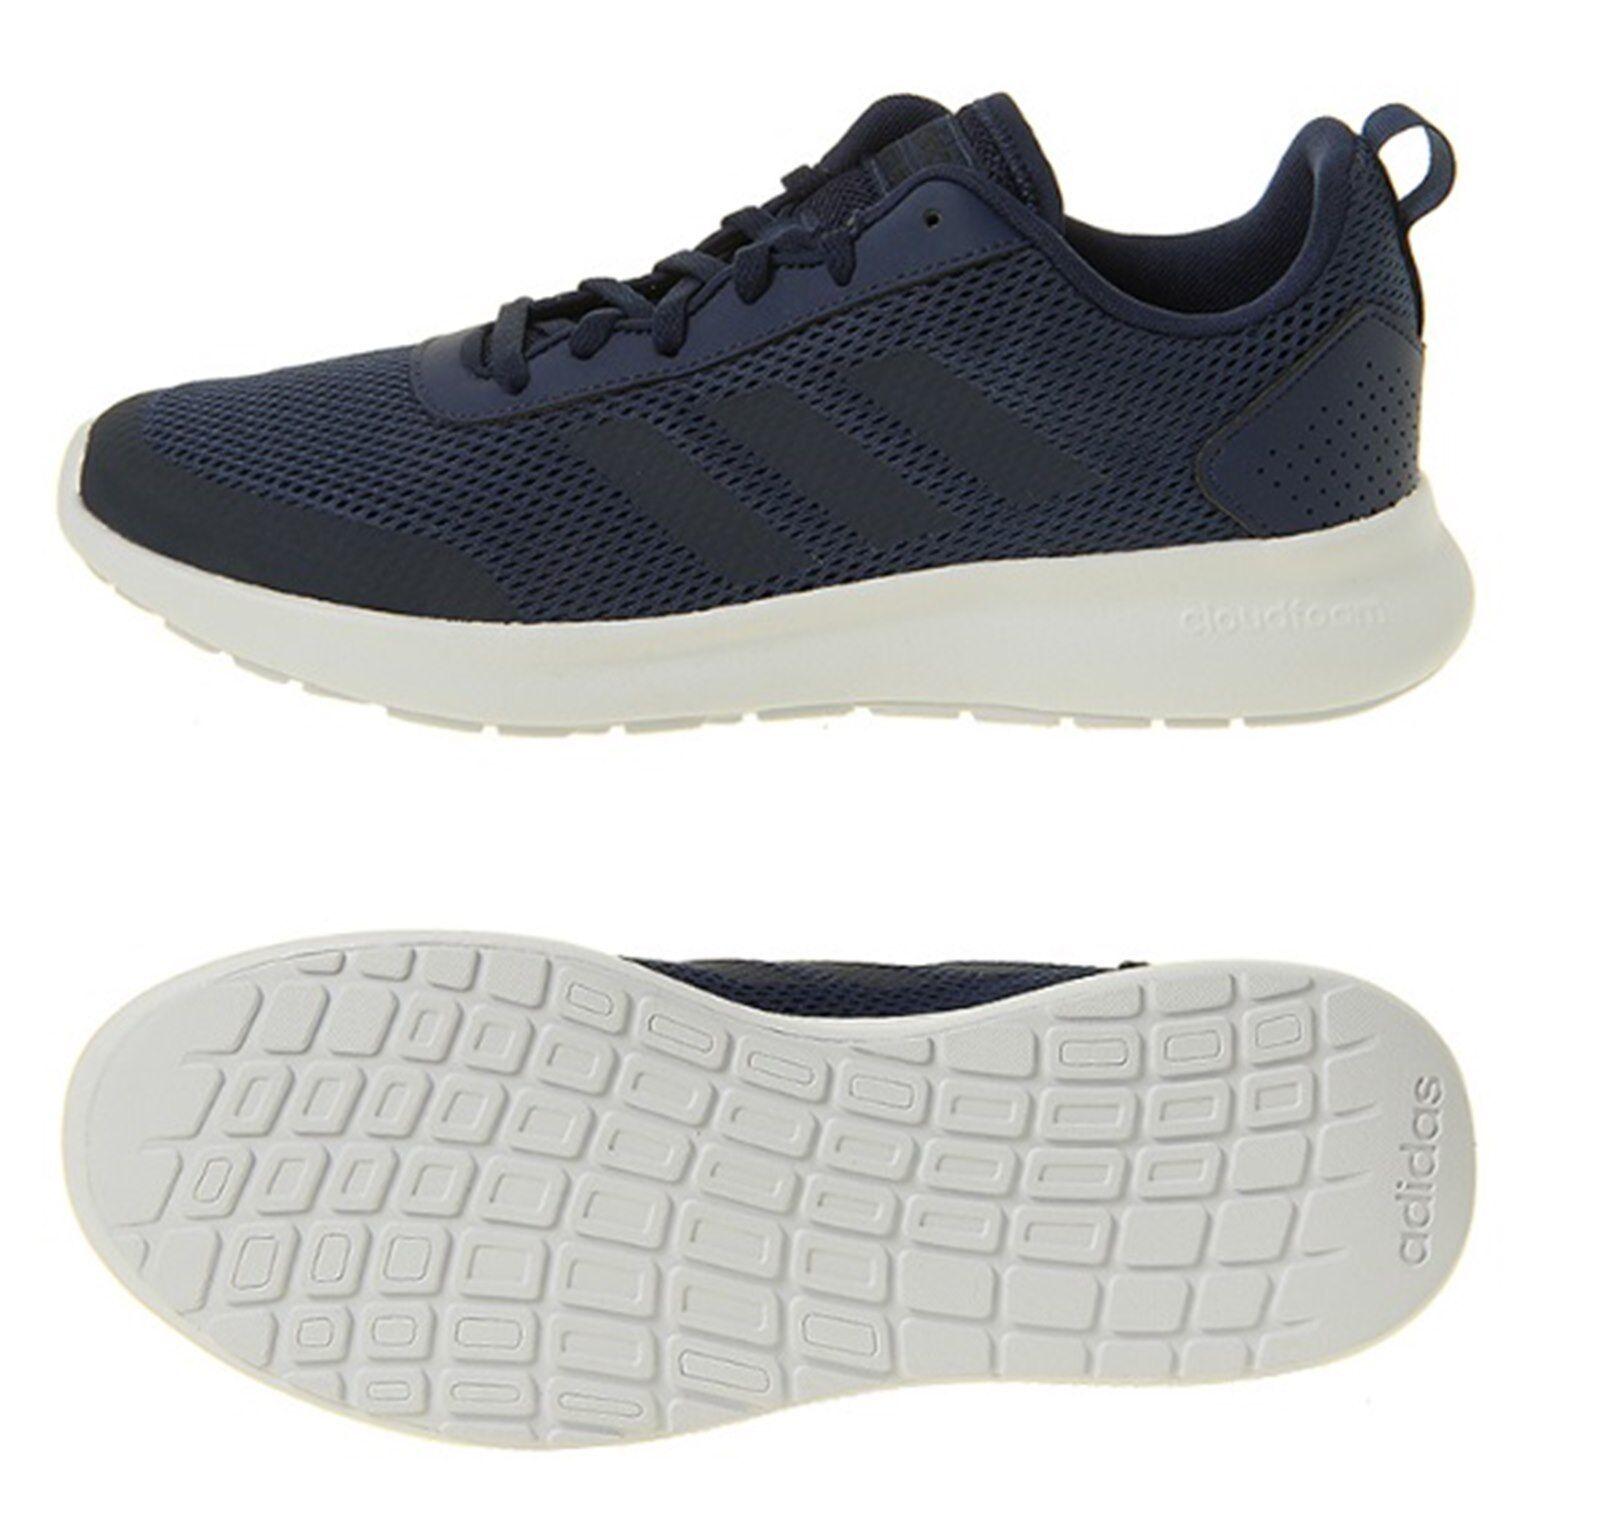 Adidas Men ELEMENT RACE Training Shoes Running Navy White Sneakers Shoe B44862